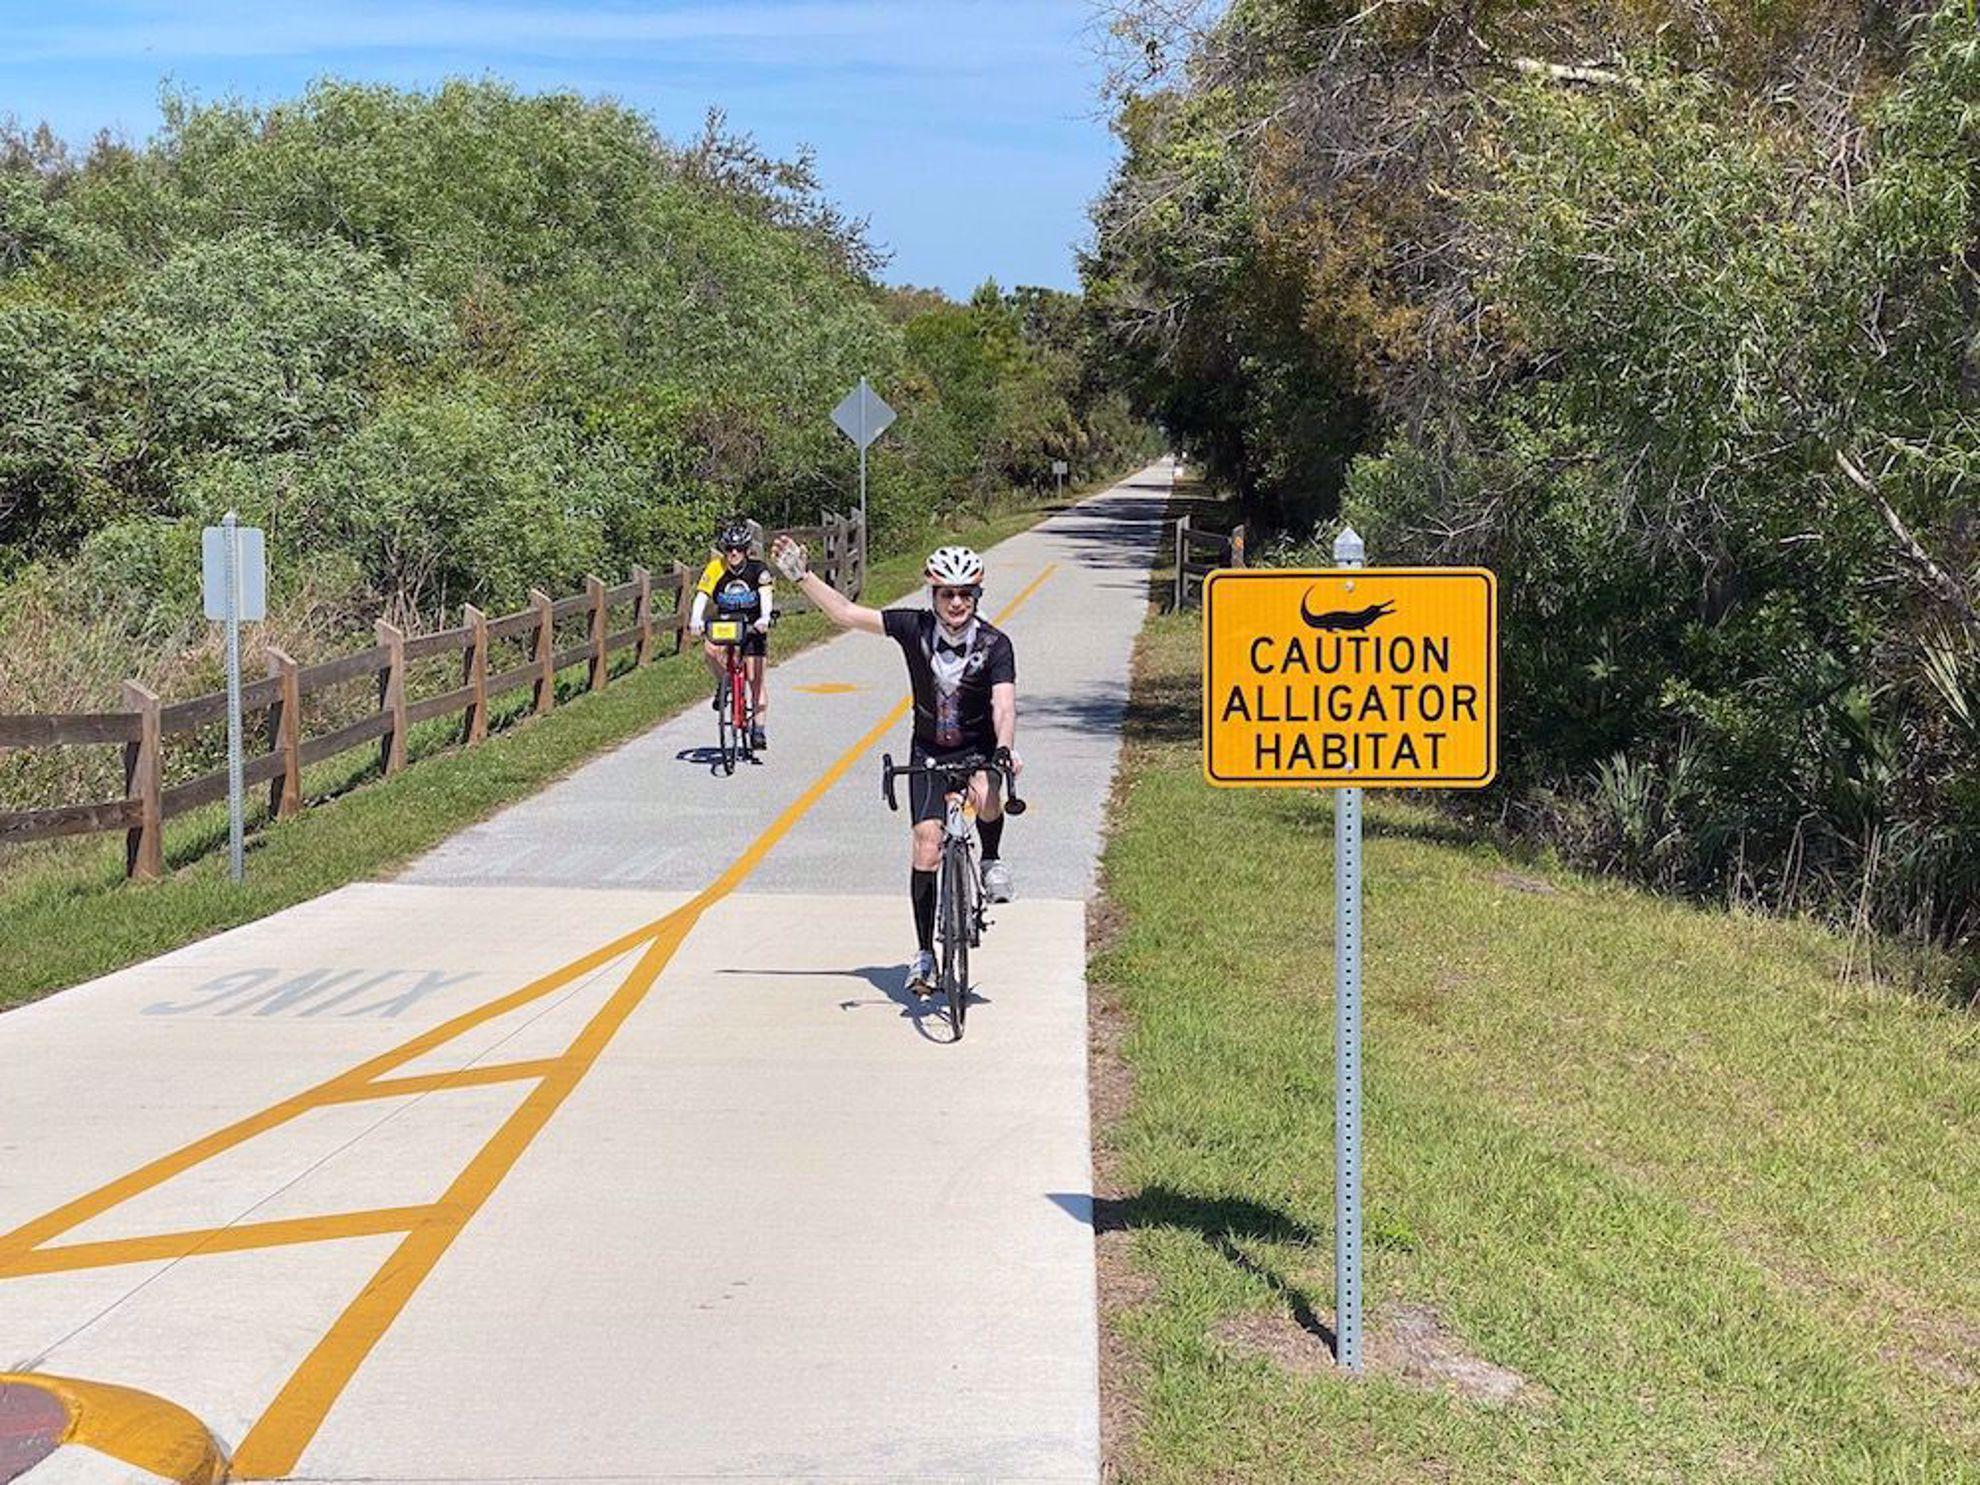 Alligator sign on trail